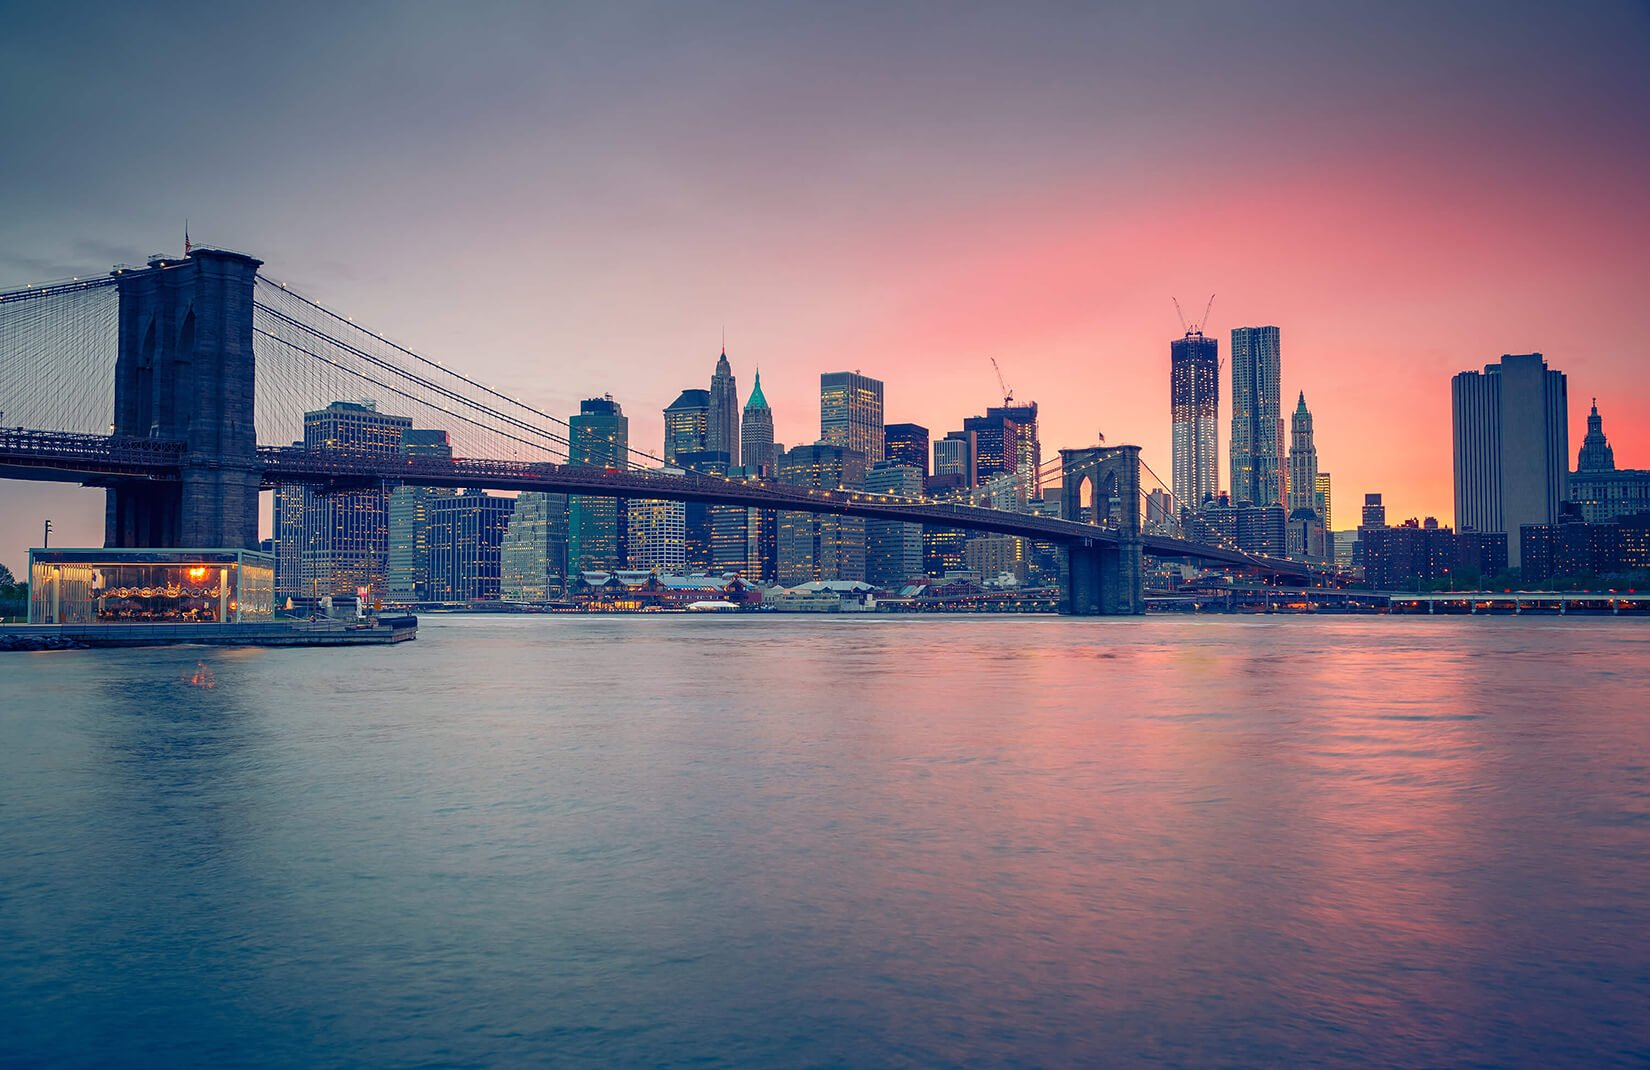 Sunset Over NYC Wallpaper Mural MuralsWallpaper 1650x1070